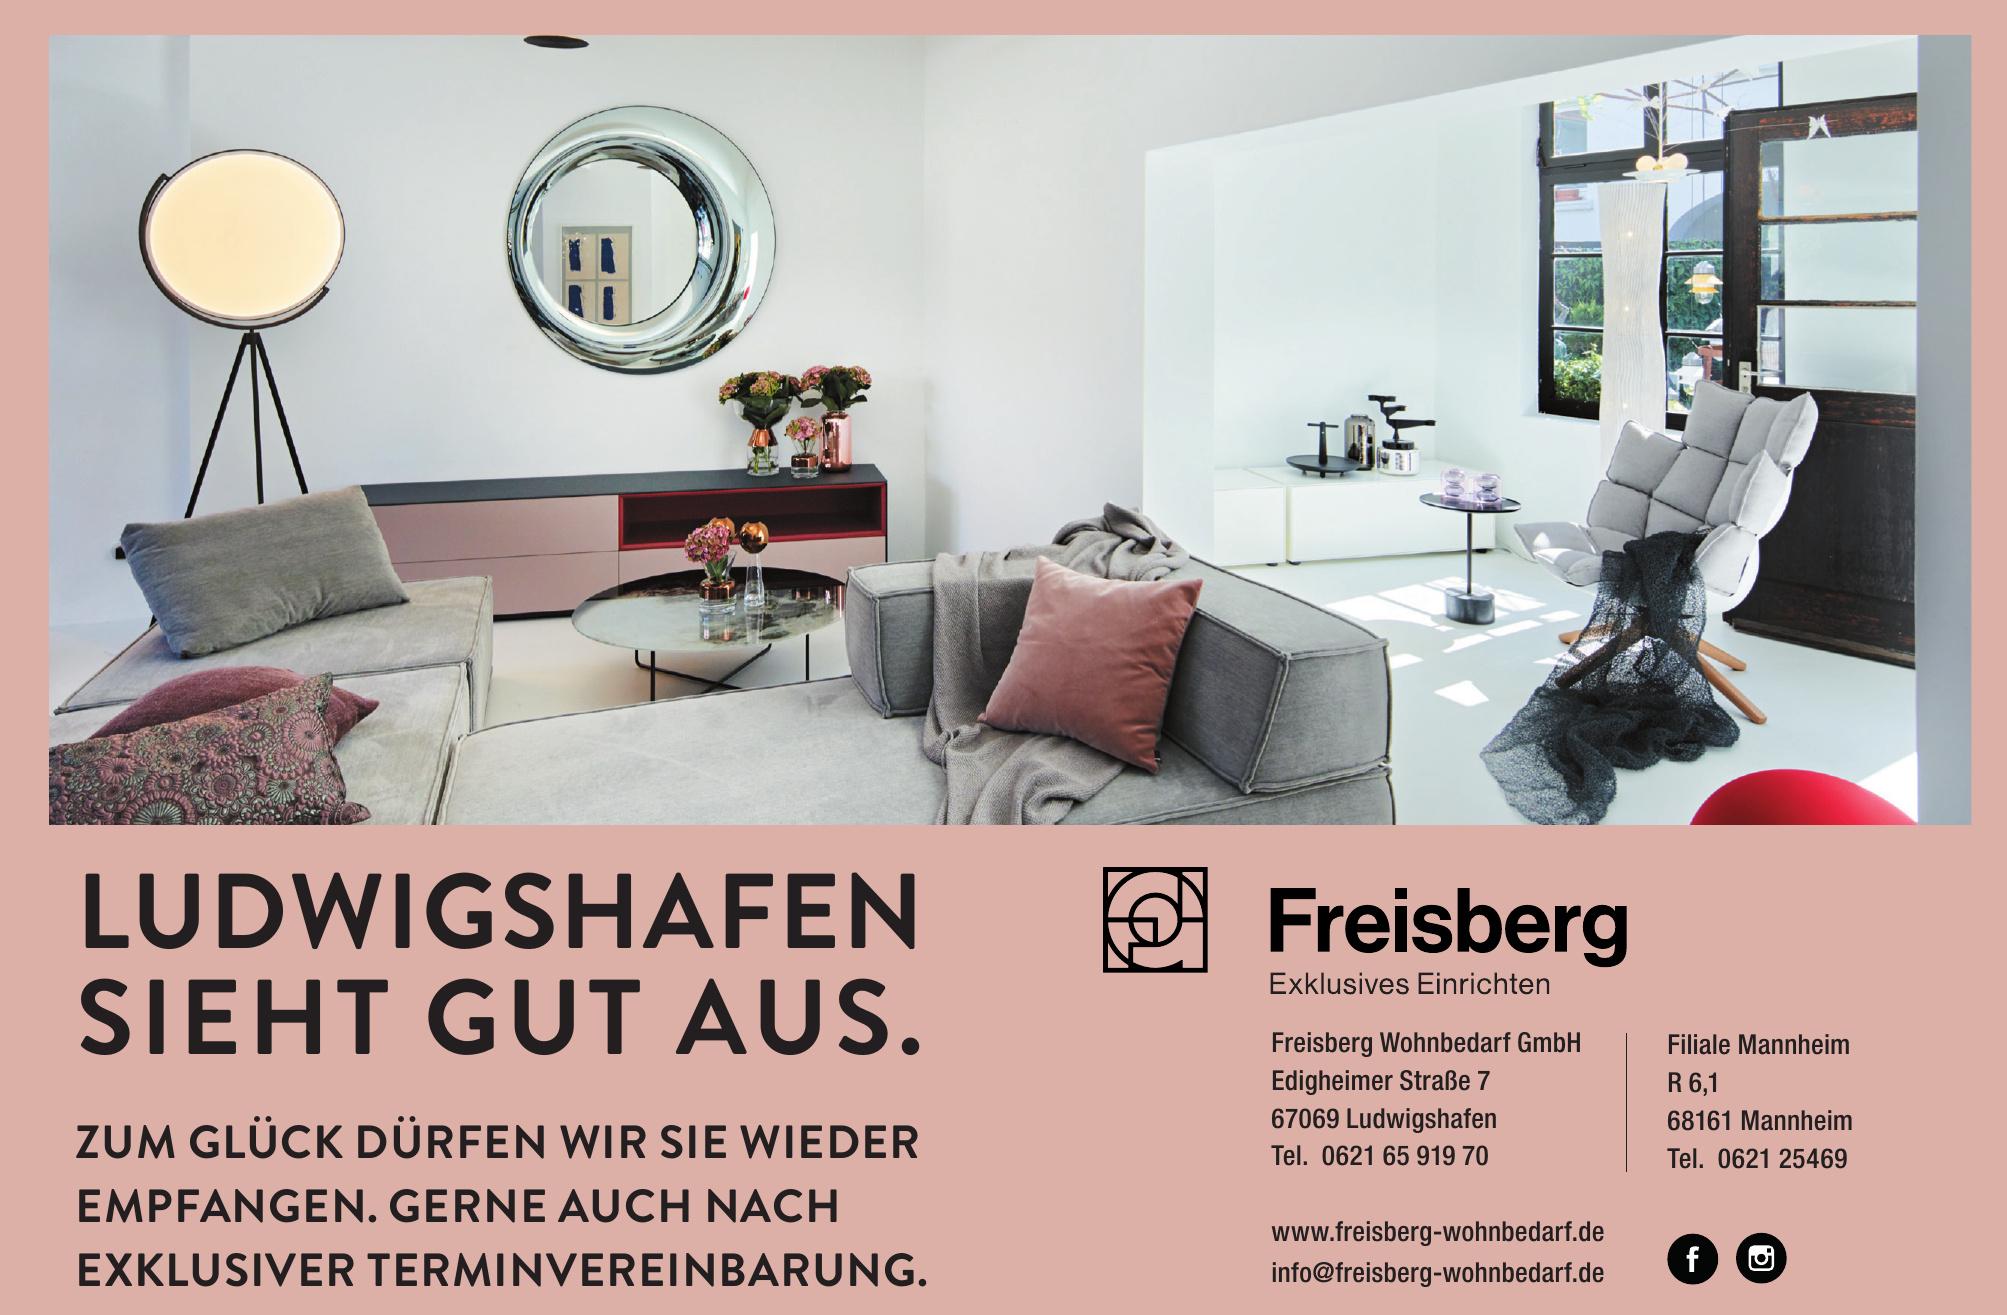 Freisberg Wohnbedarf GmbH